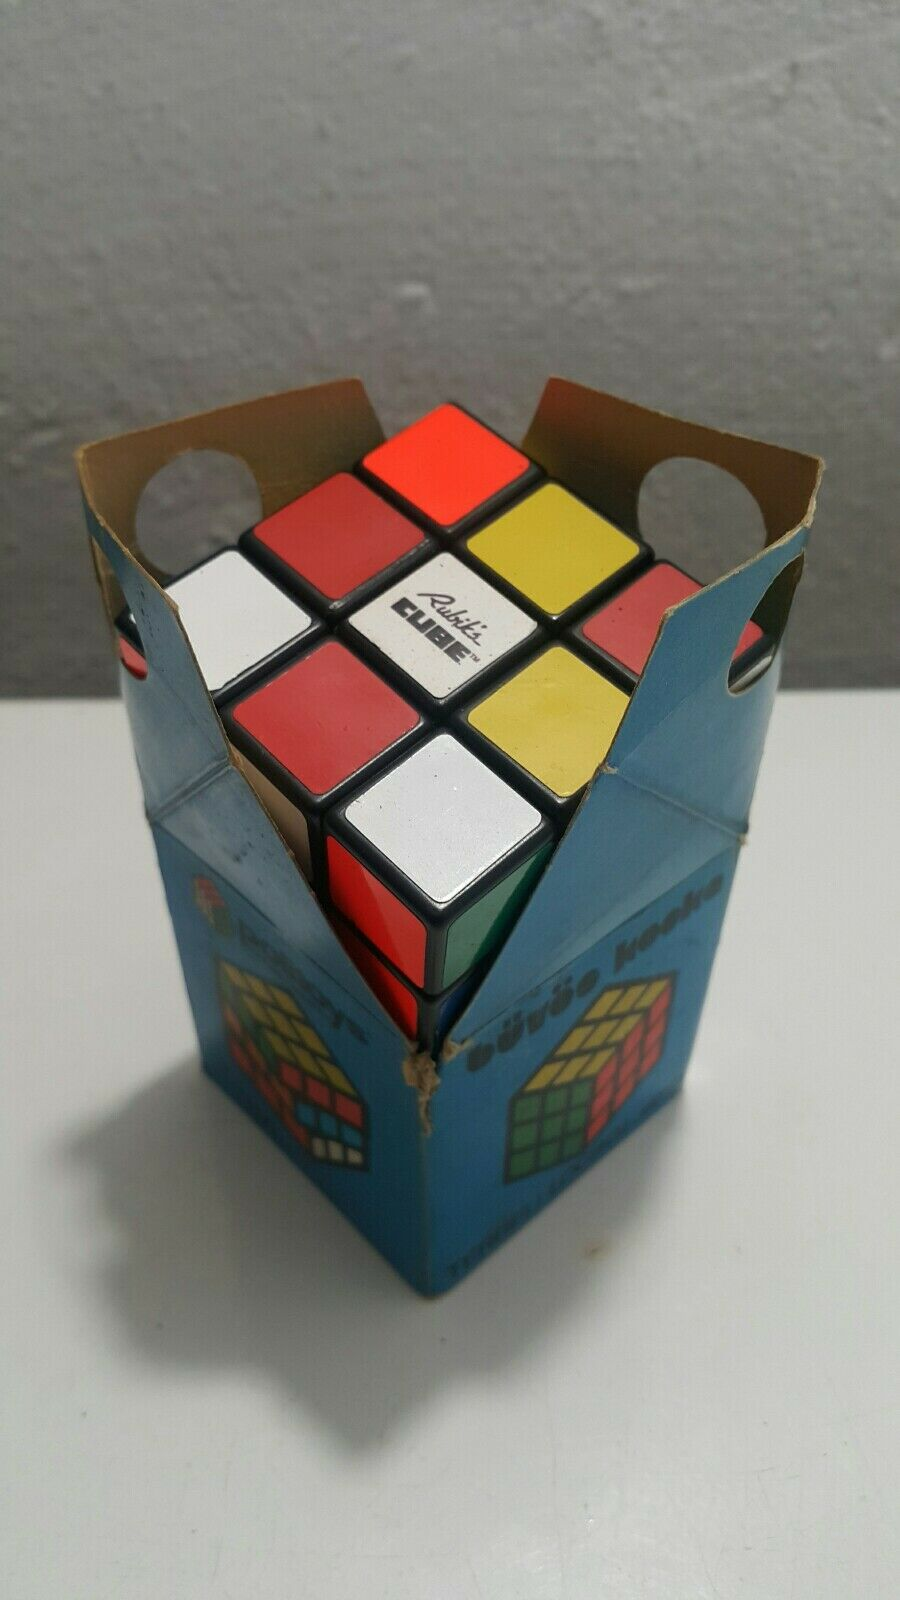 VINTAGE RUBIK'S CUBE Akademia boîte d'origine Budapest Hongrie tordu Puzzle